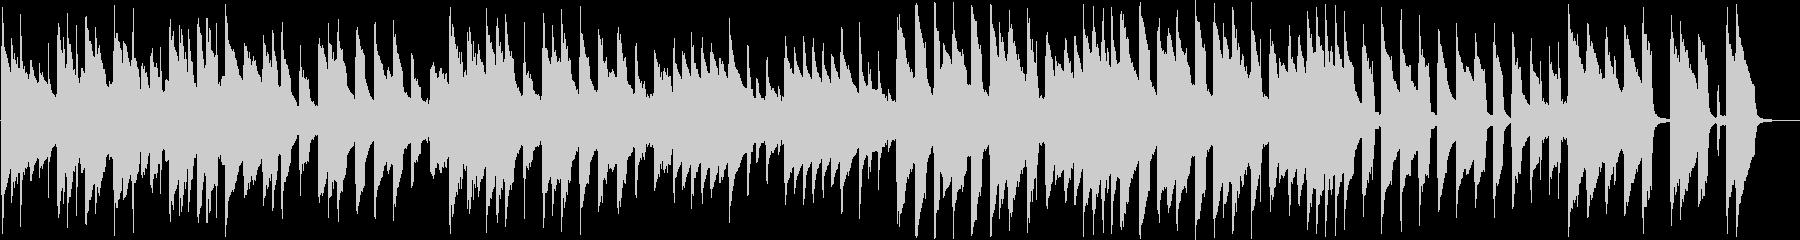 8bit コミカルなダークメルヘンBGMの未再生の波形